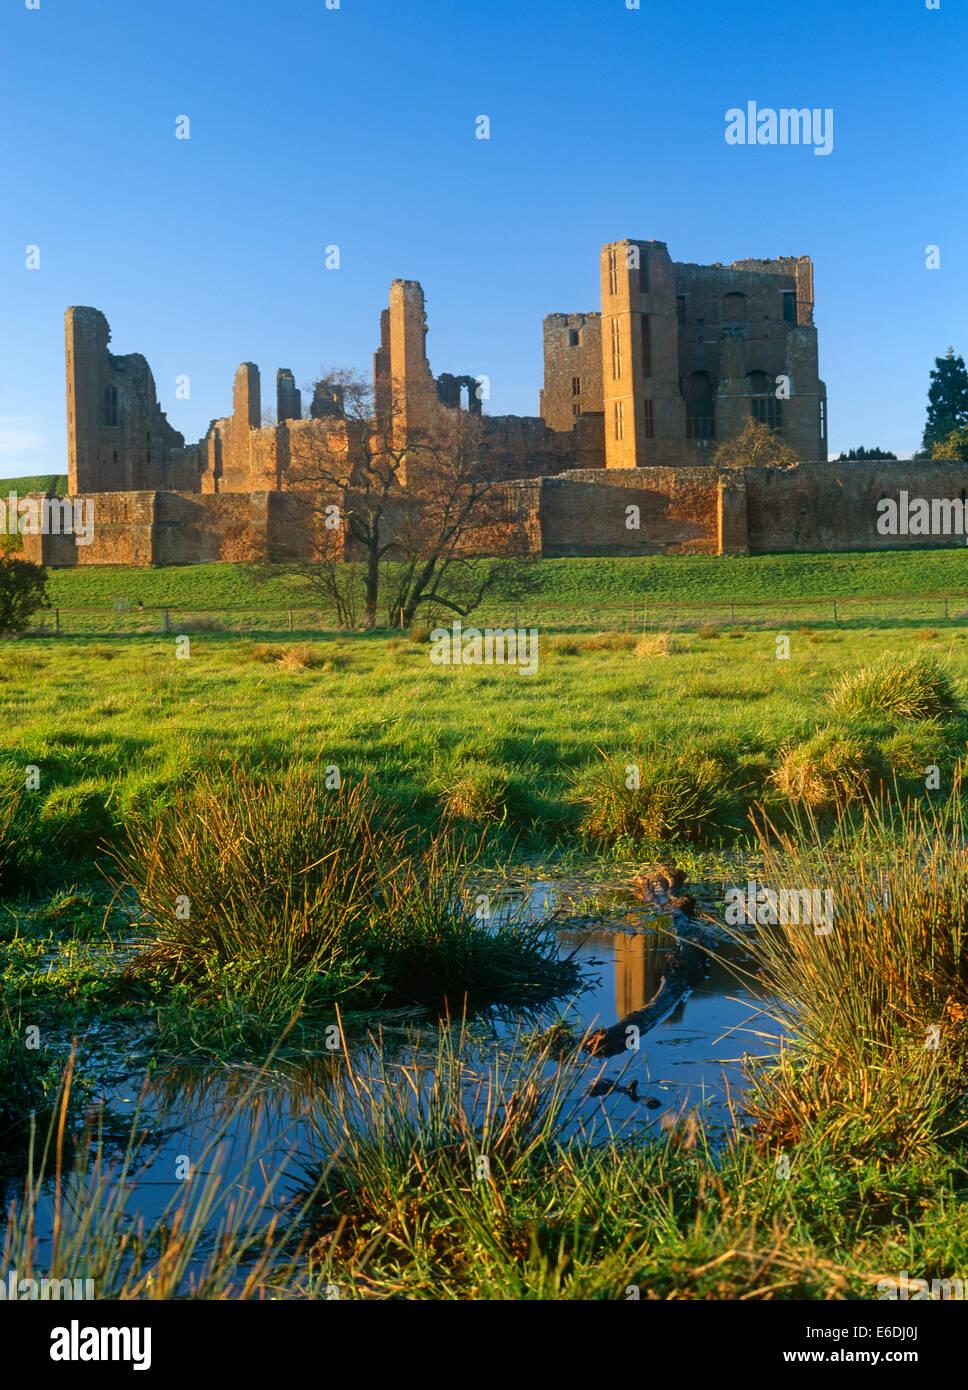 Kenilworth Castle Warwickshire UK - Stock Image